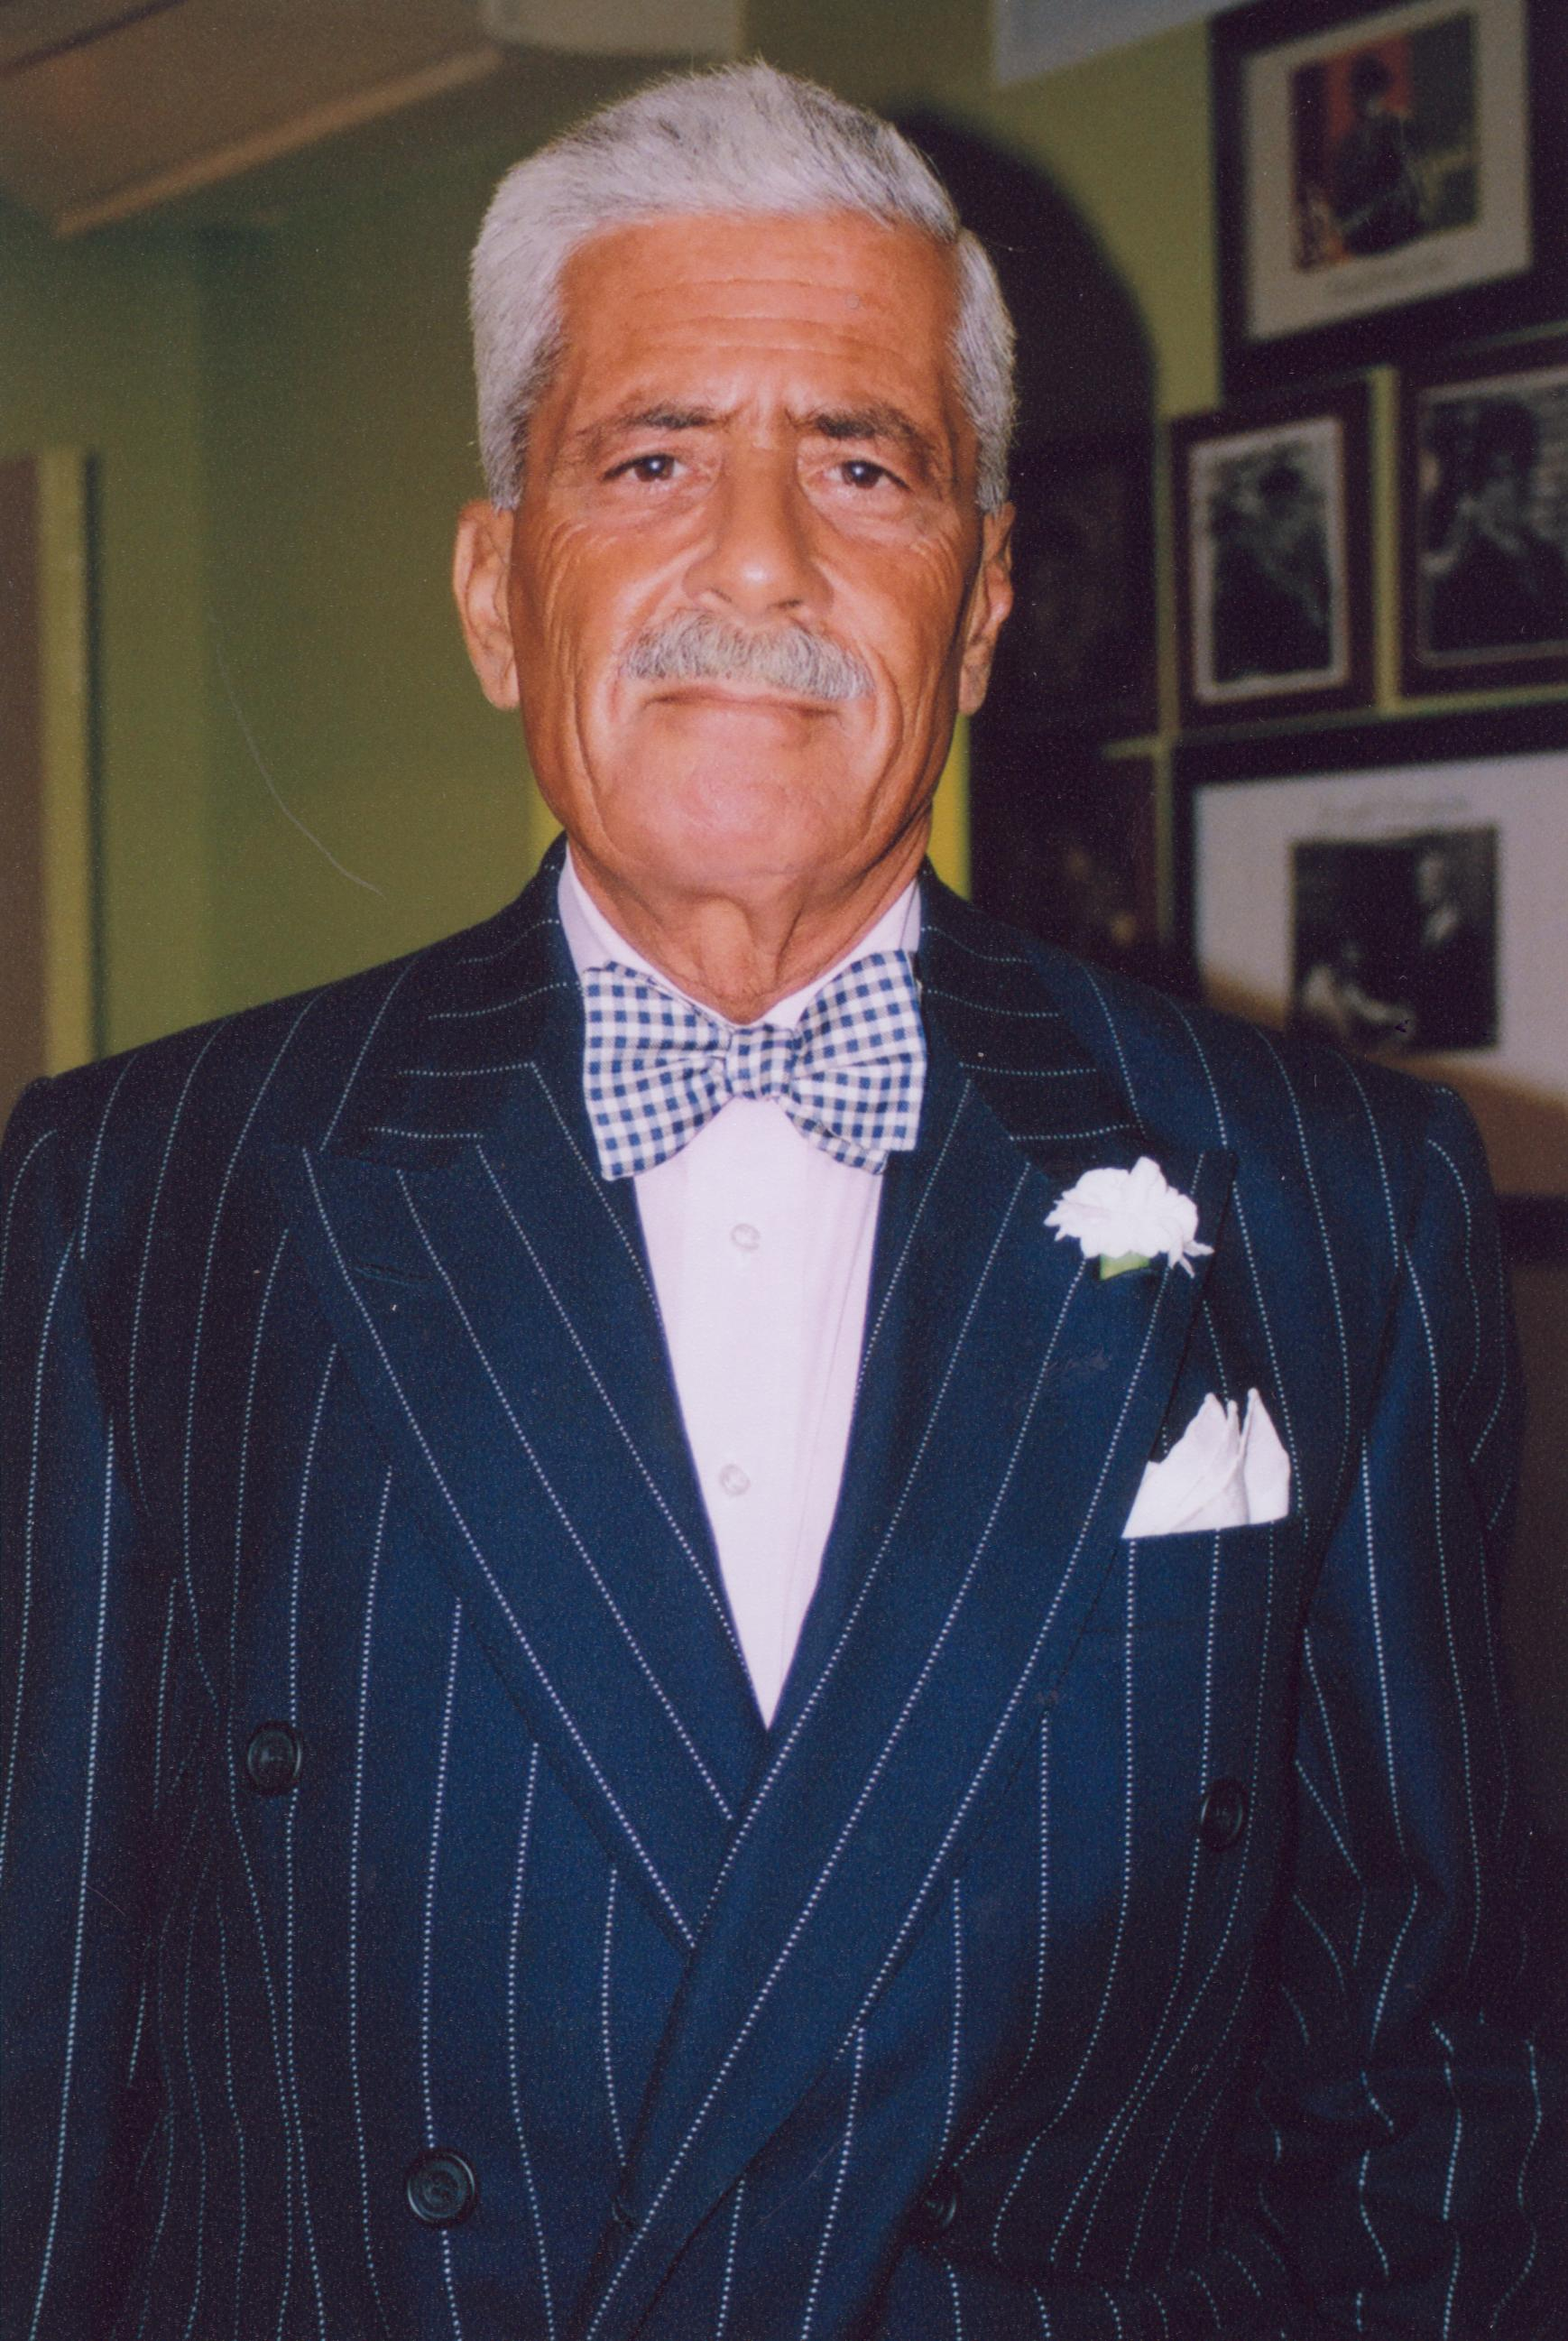 Elegance of a Gentleman